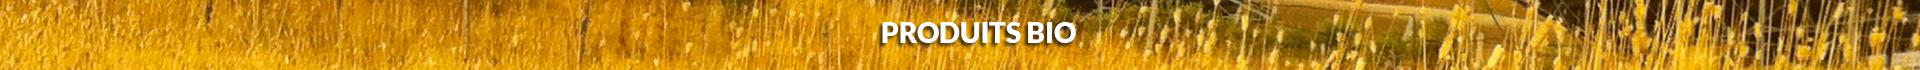 bio produits